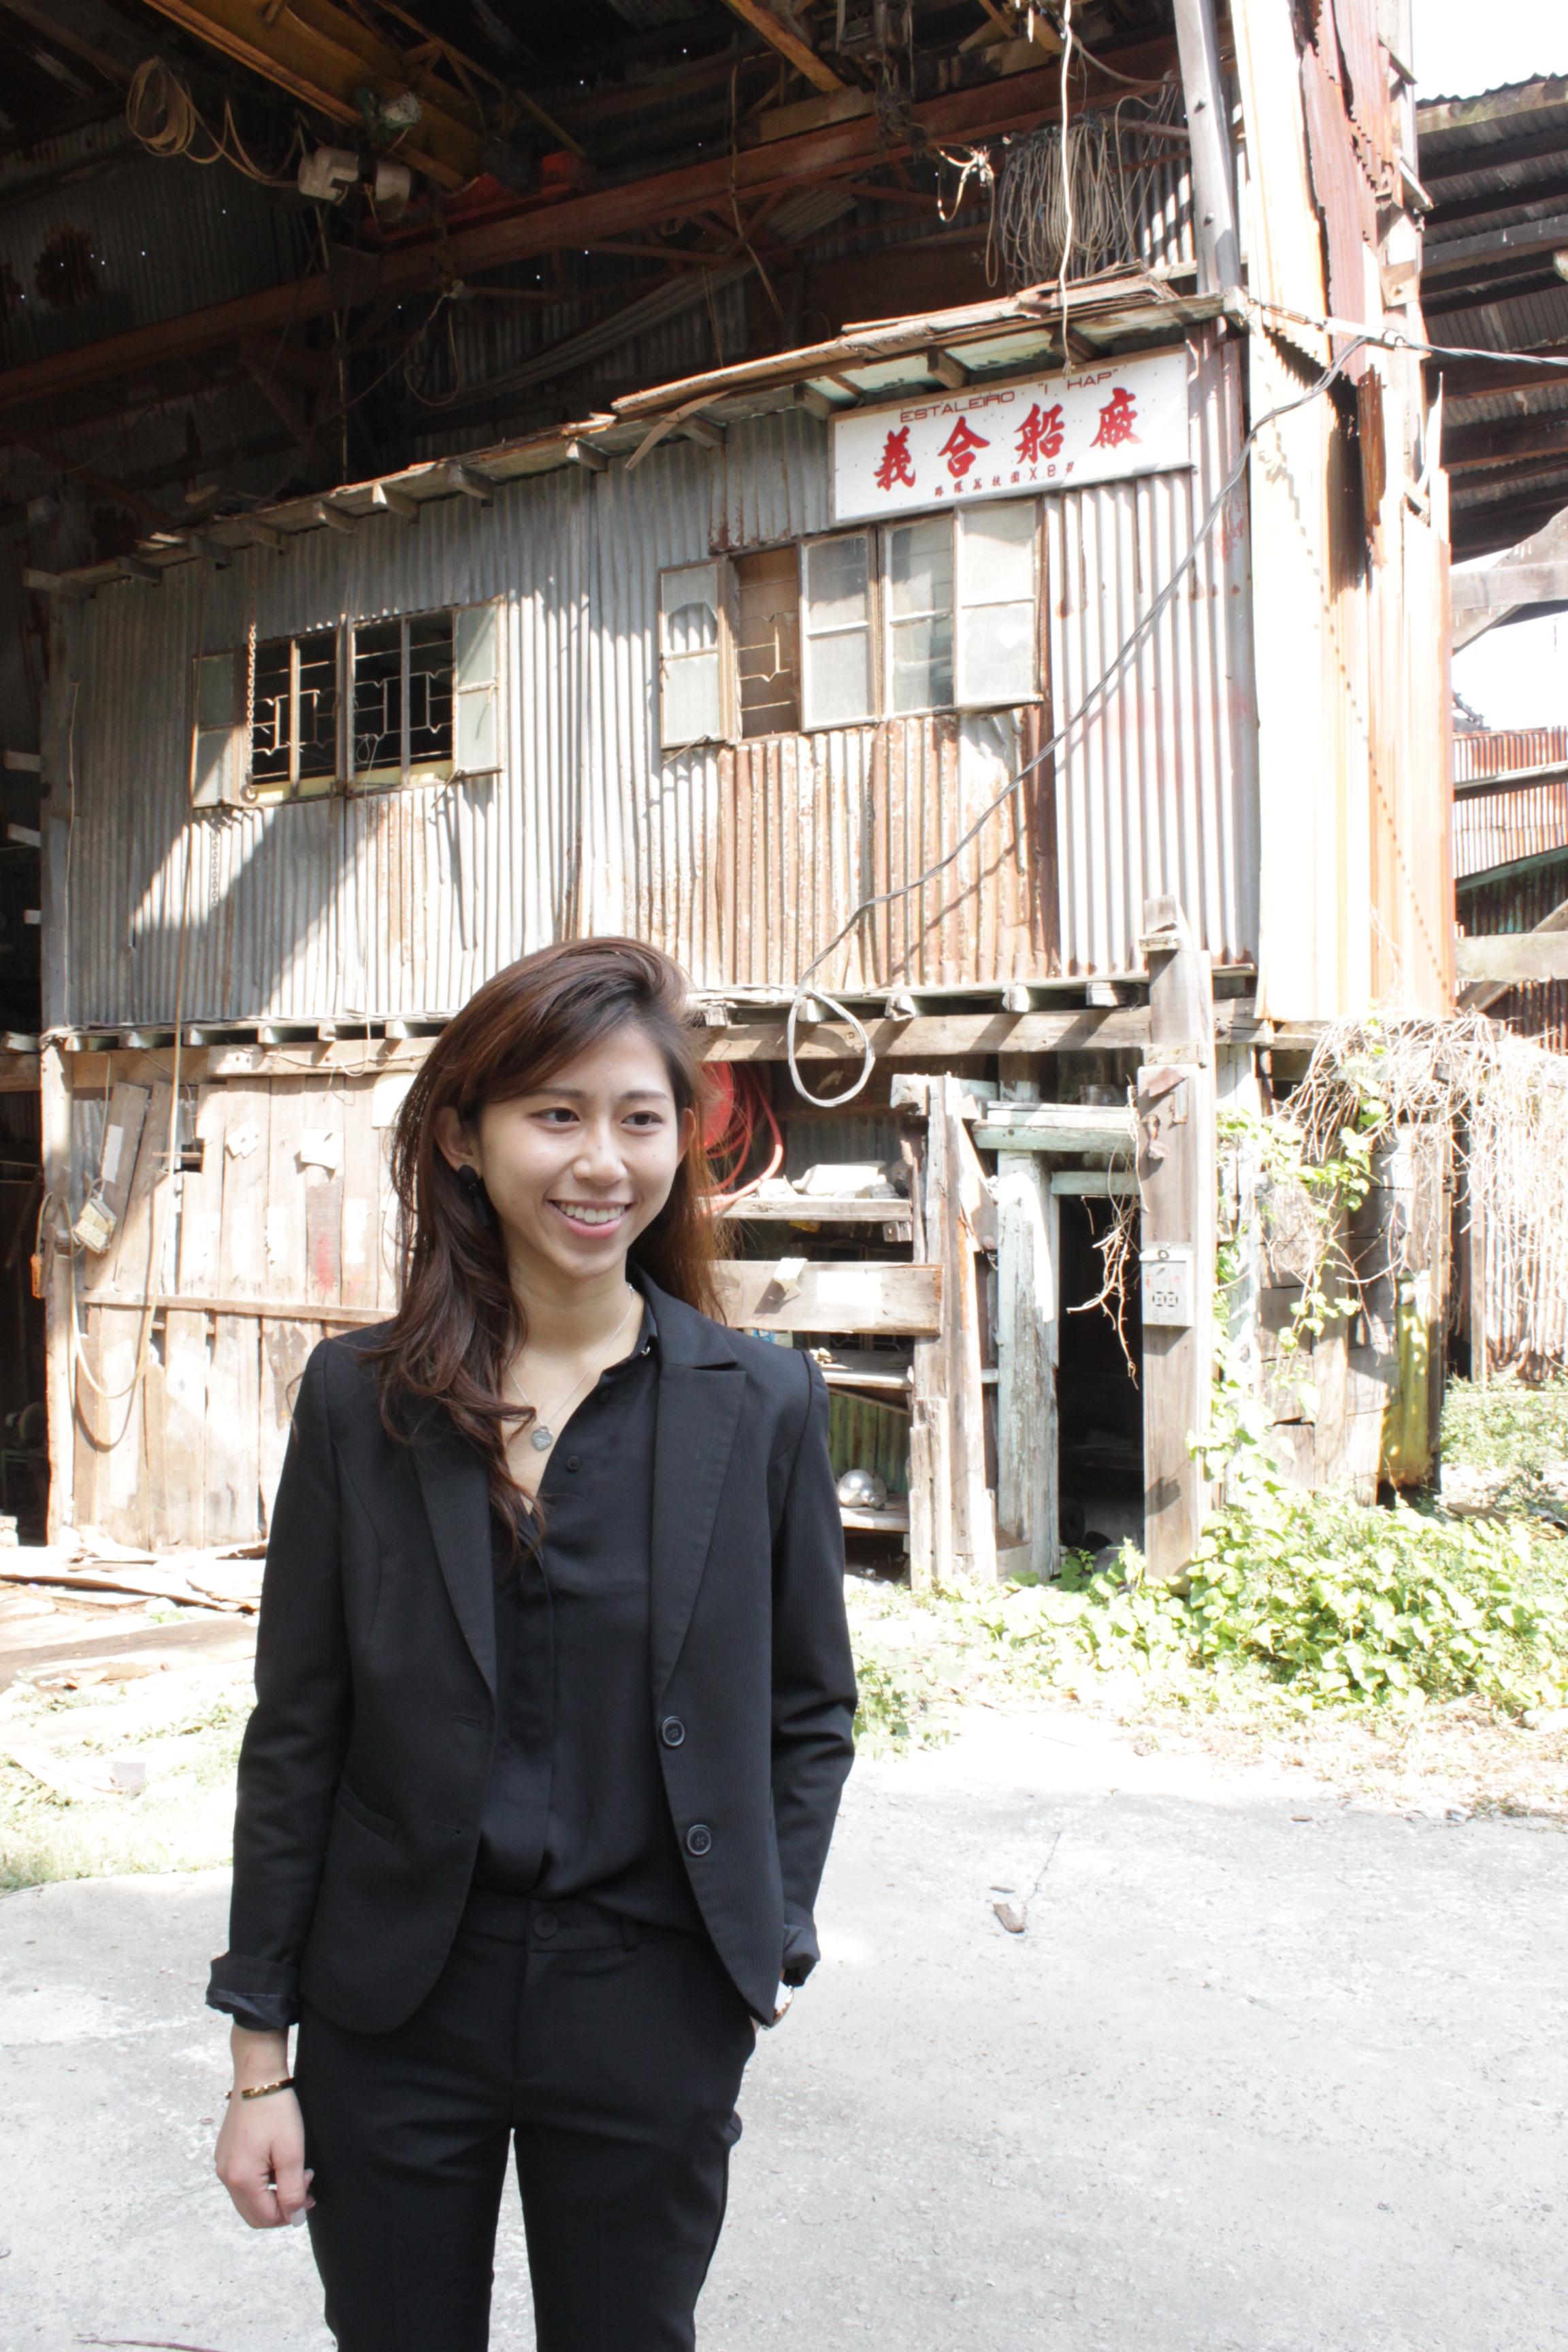 b+ab black blazer / H&M black sheer shirt / Black tailored pants / Vanishing Elephant monk strap loafers /  DearPostman urbanism earrings